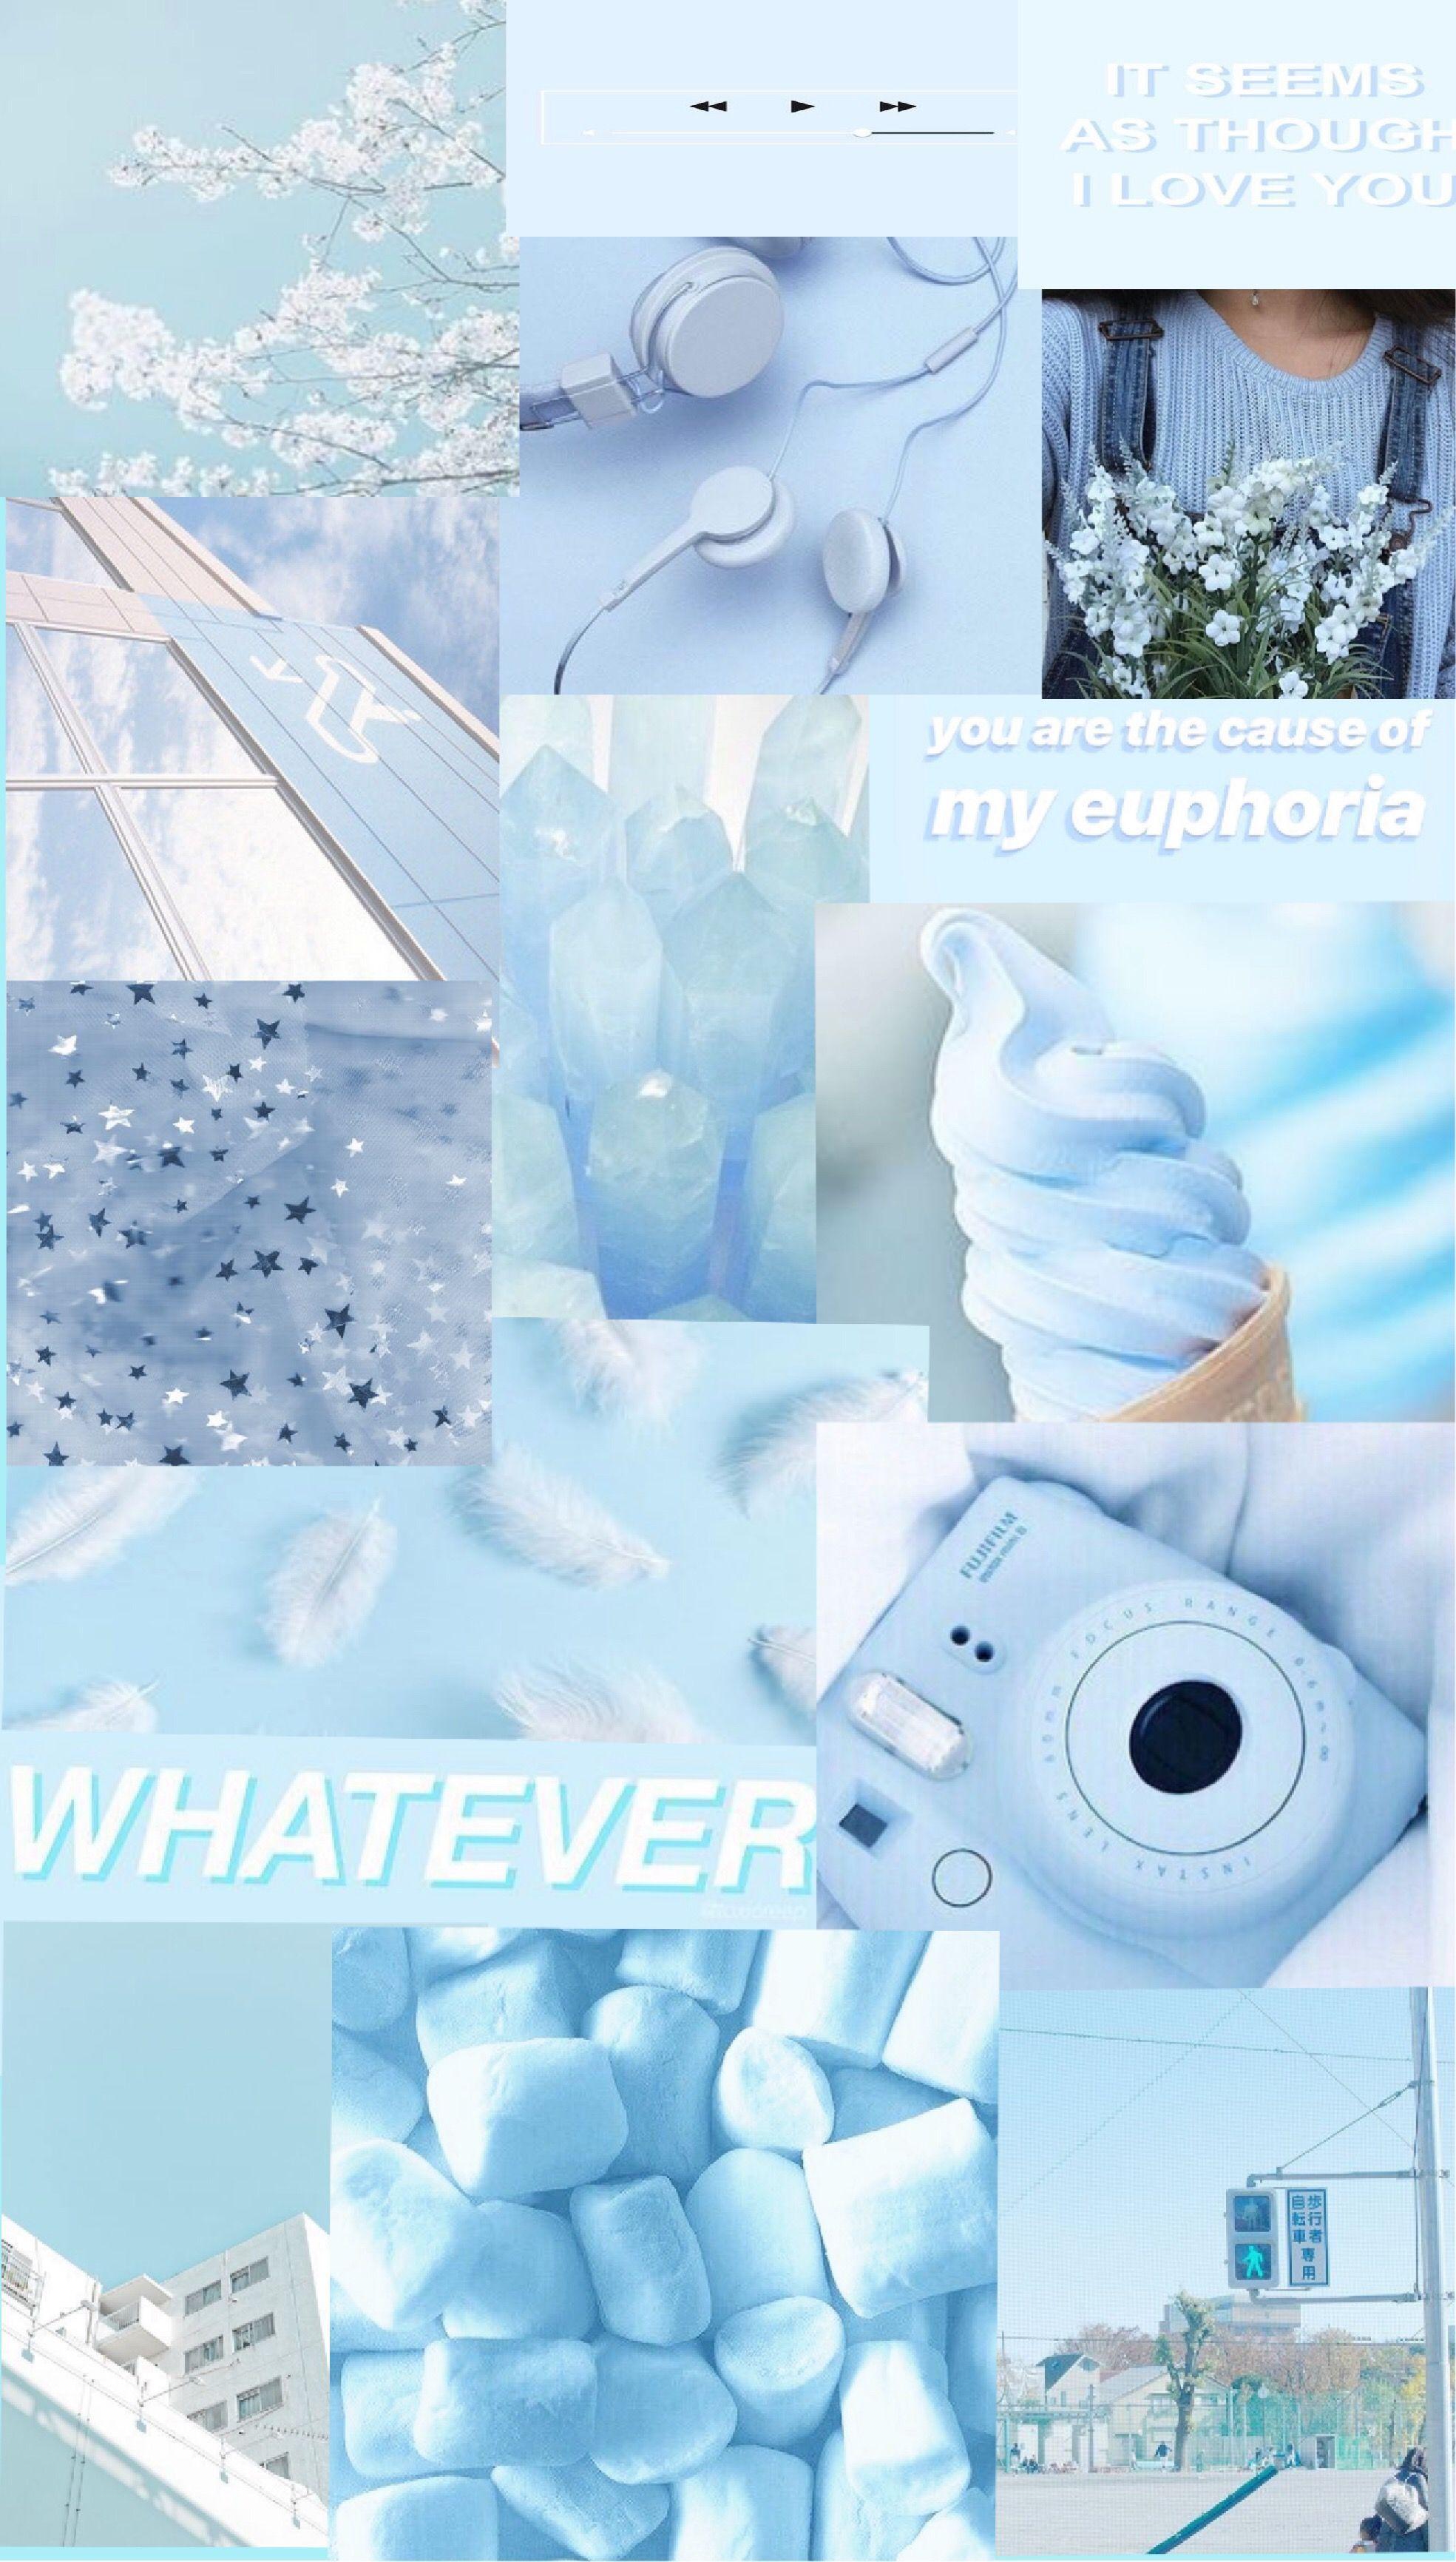 Blueaesthetic Aesthetic Pastel Wallpaper Wallpaper Iphone Cute Blue Wallpaper Iphone